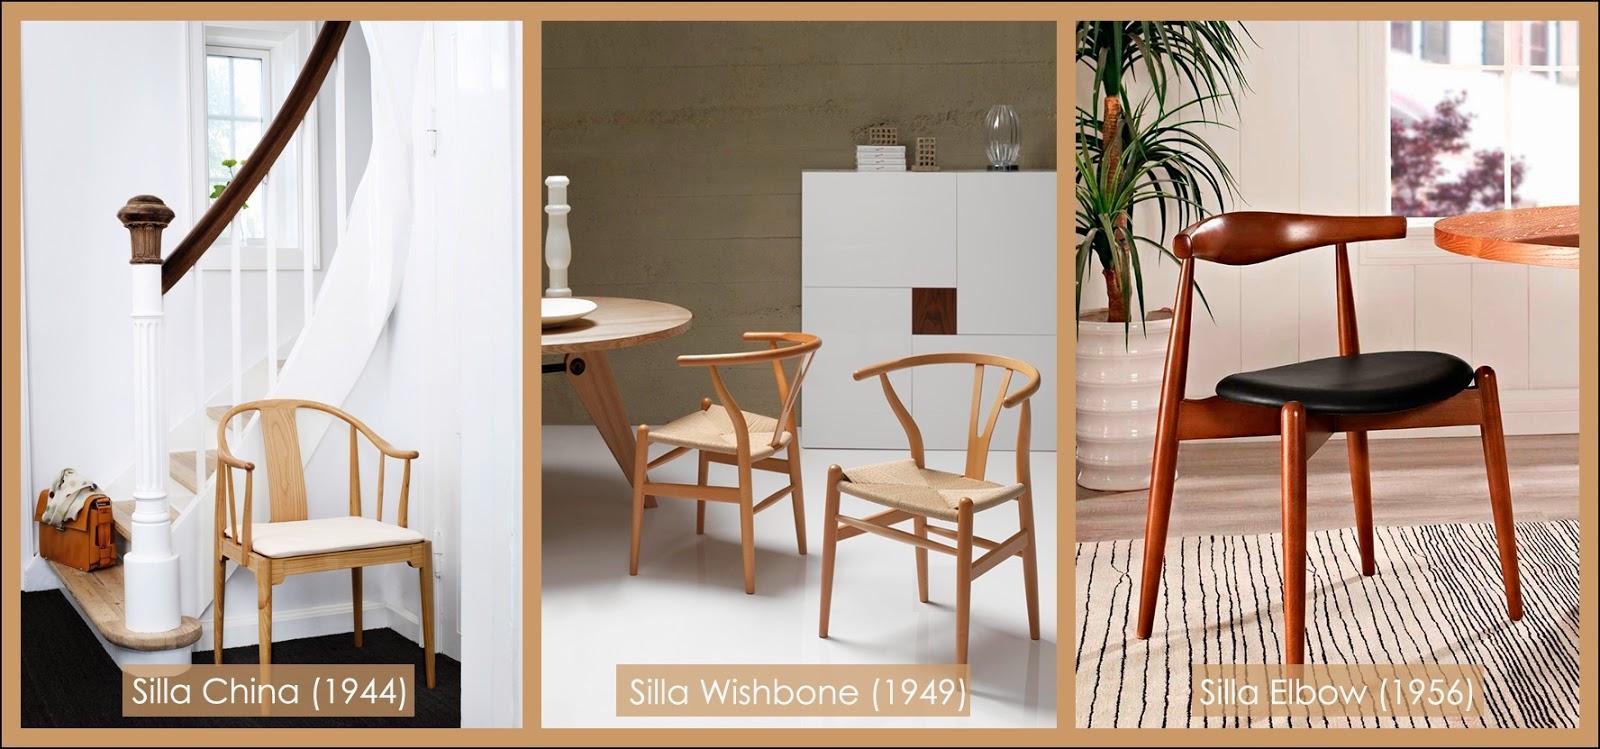 Blog de mbar muebles mueble for Muebles escandinavos online